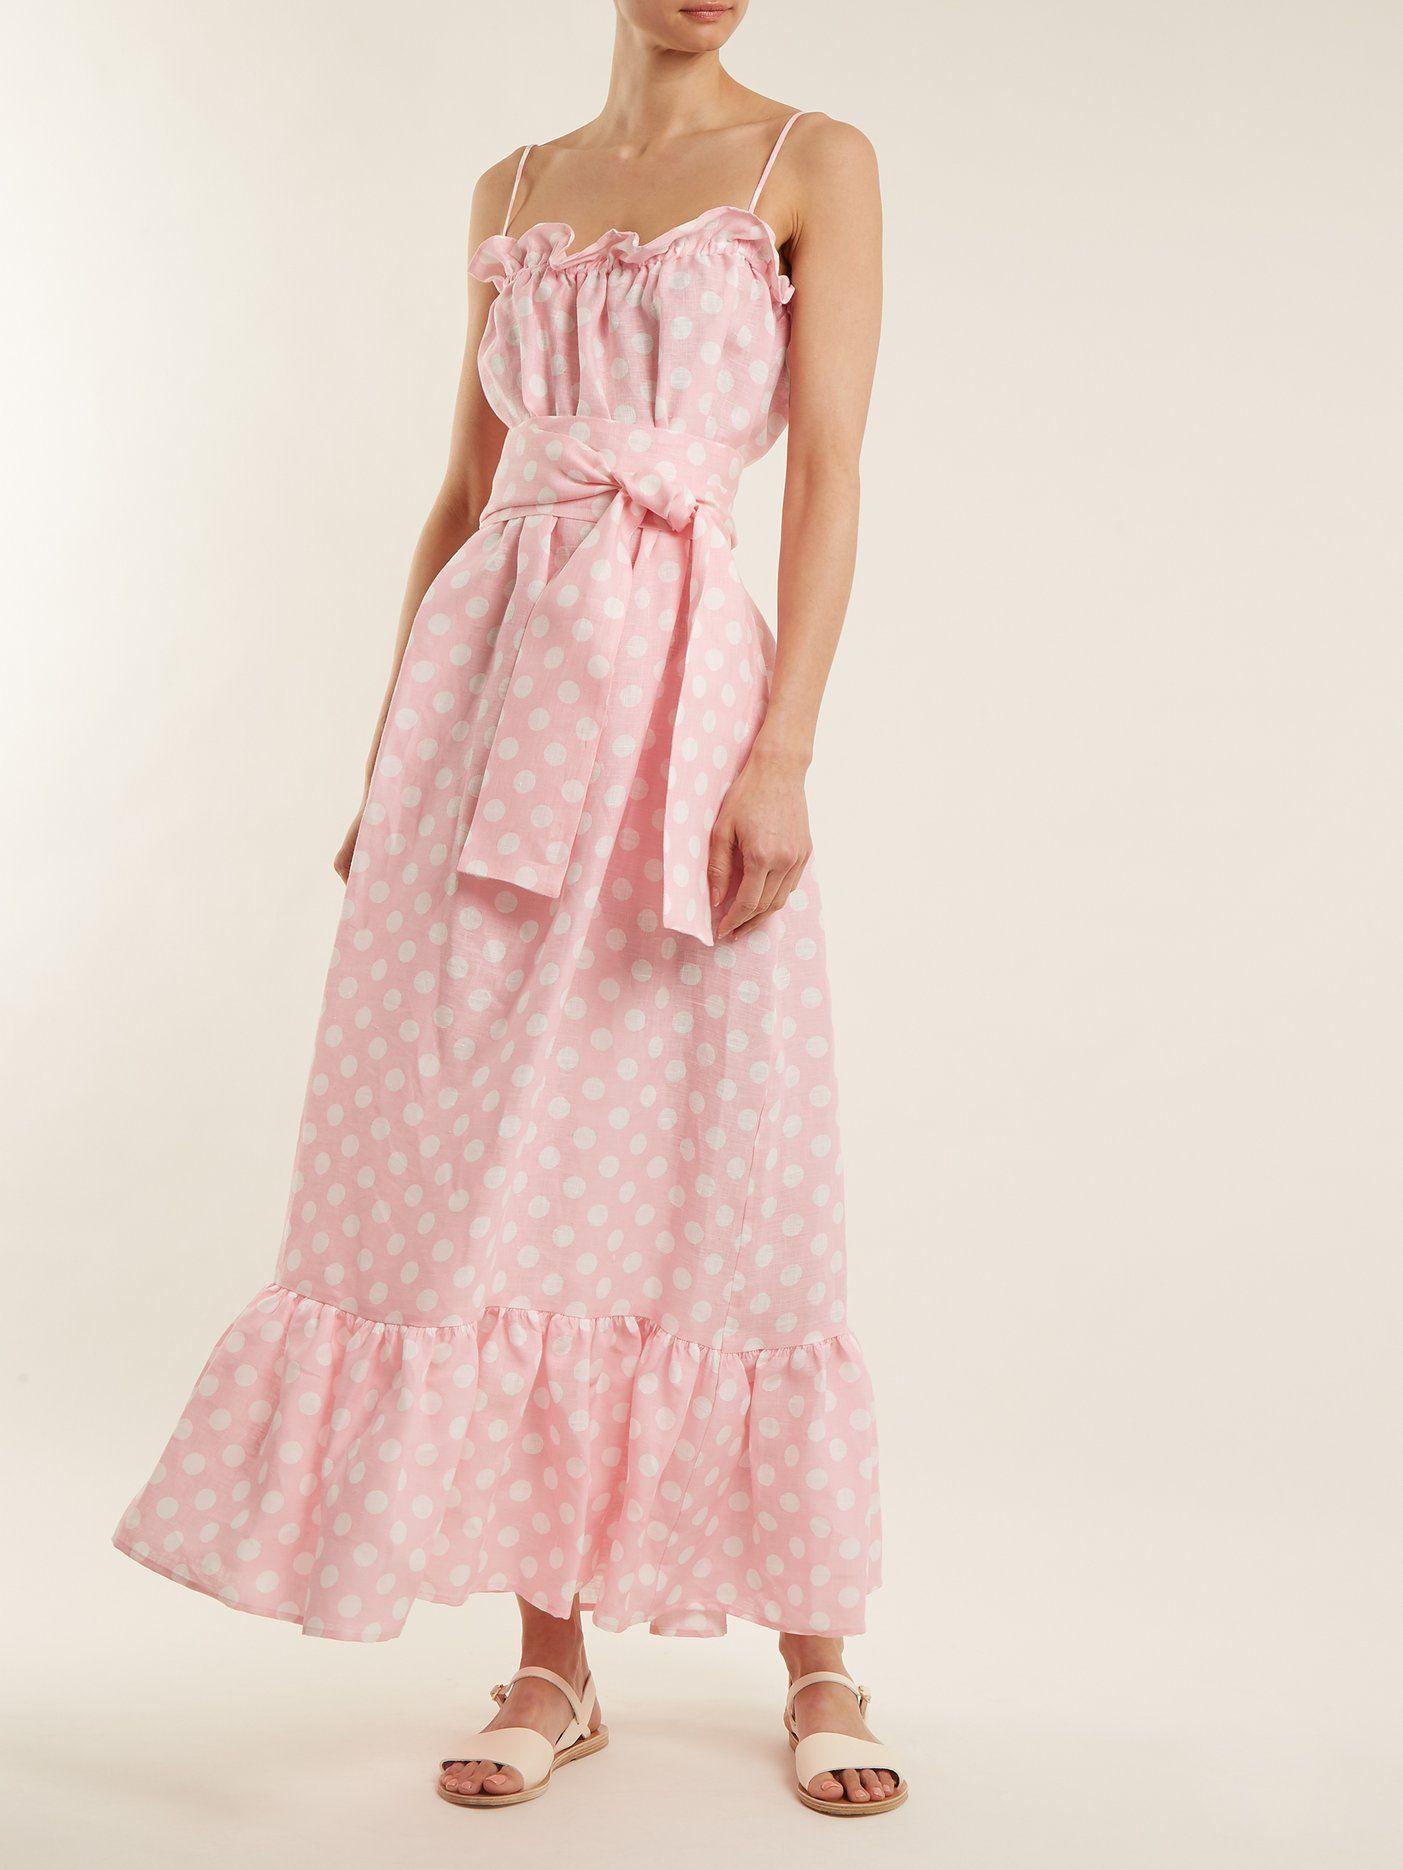 60ec286bd0 Click here to buy Lisa Marie Fernandez Liz linen maxi dress at  MATCHESFASHION.COM